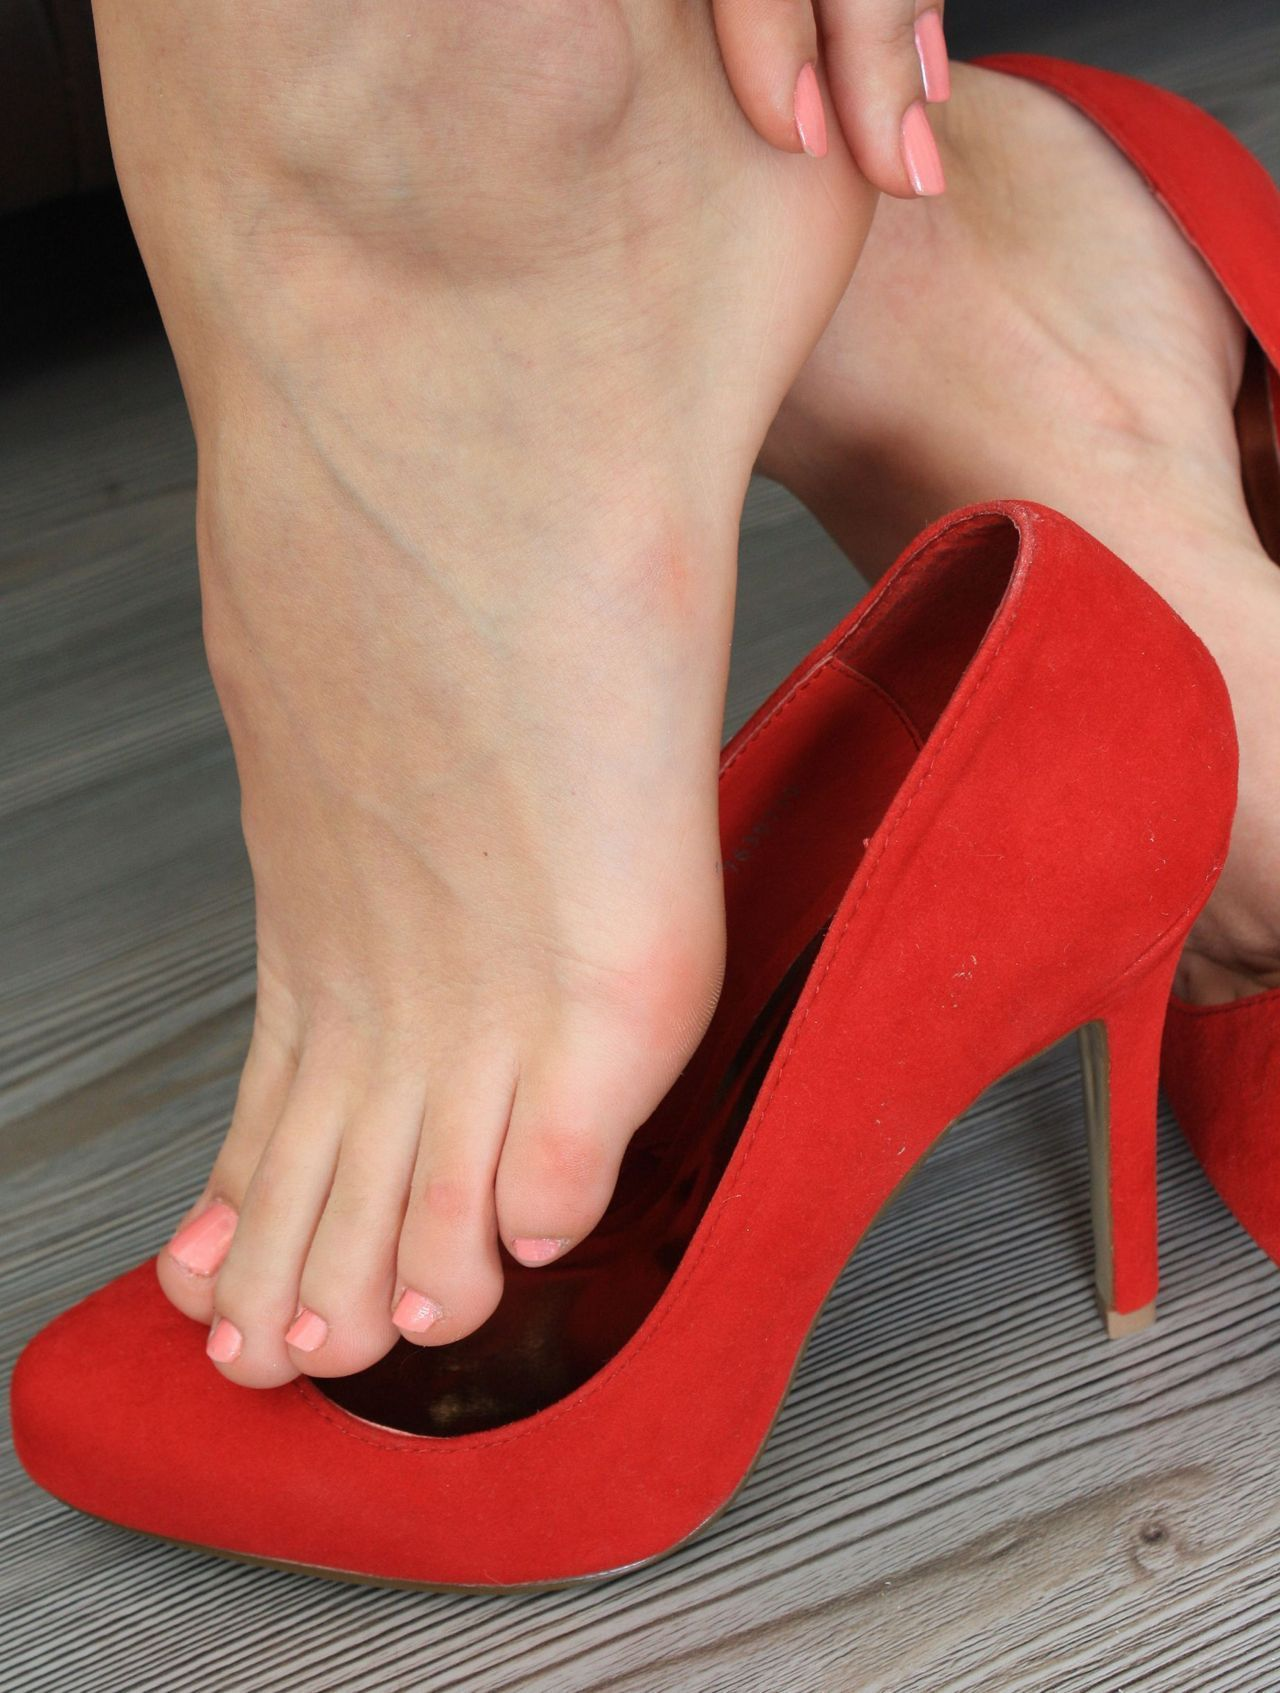 Womens health foot fetish